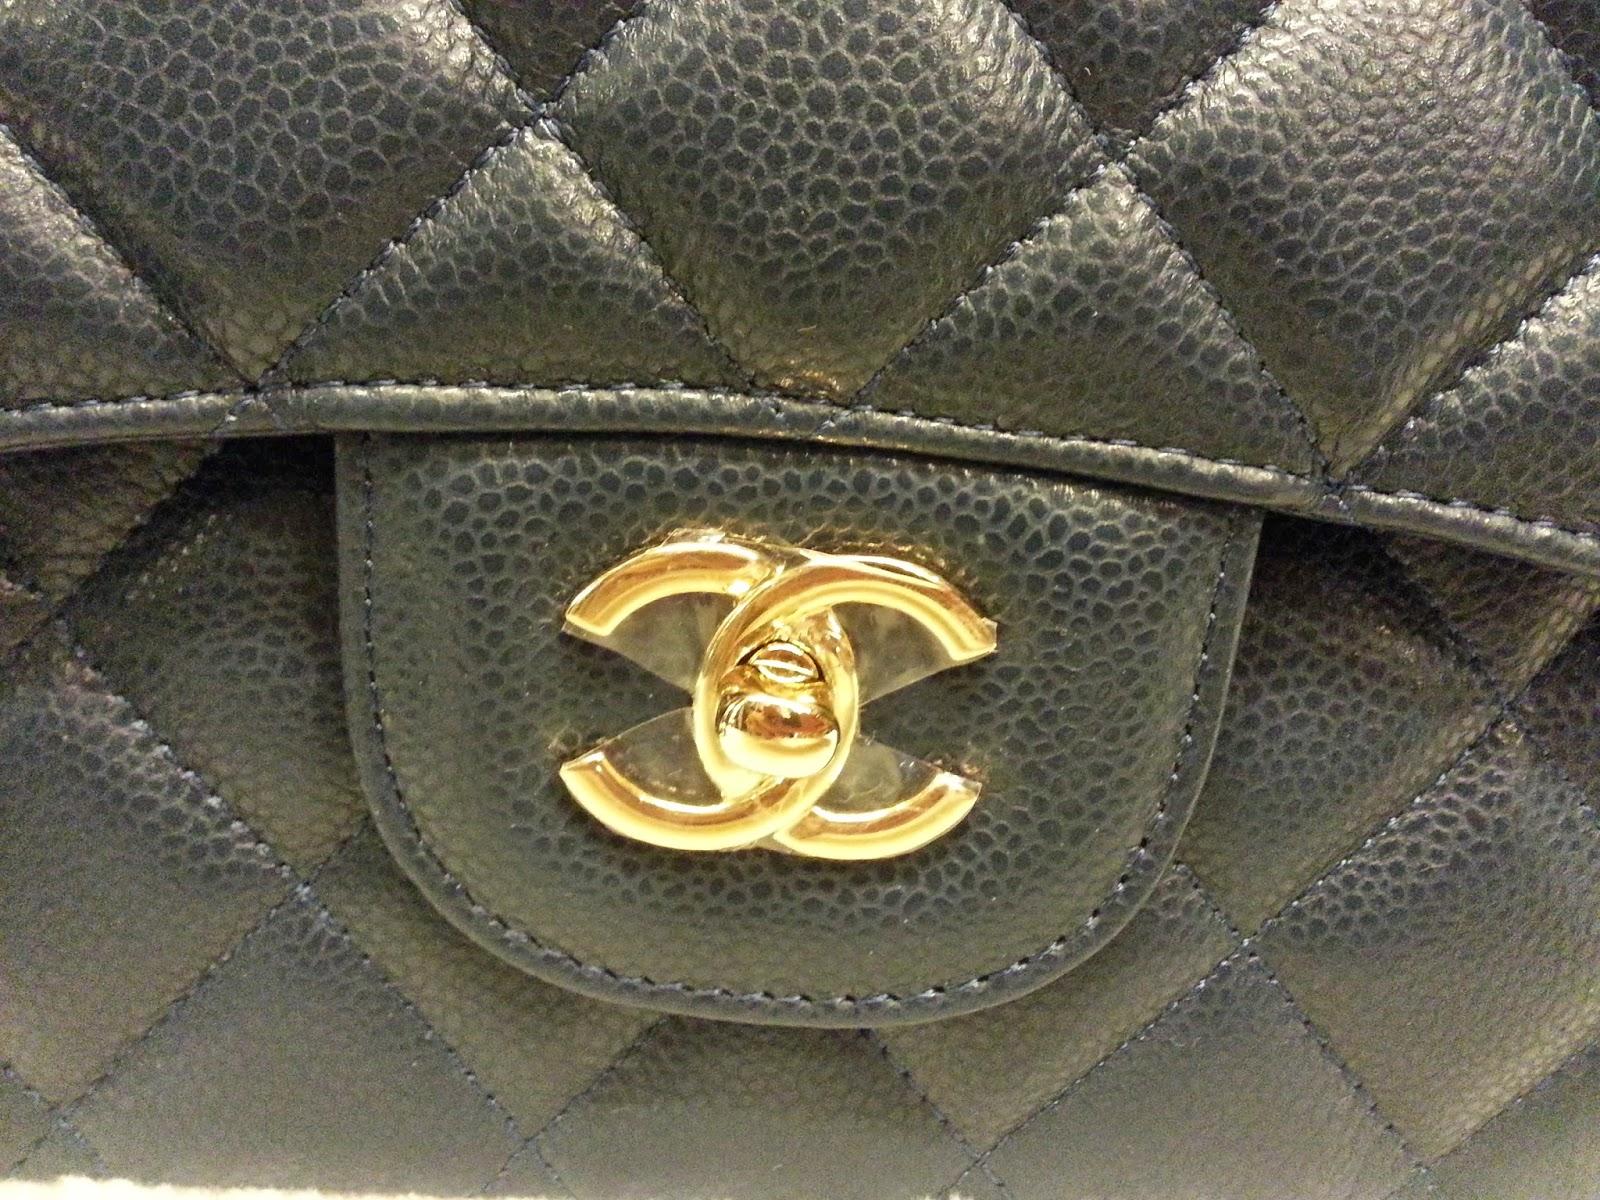 45066cb84c65 Deal Treasure: Chanel Classic Jumbo Dark Blue Caviar Leather Double ...